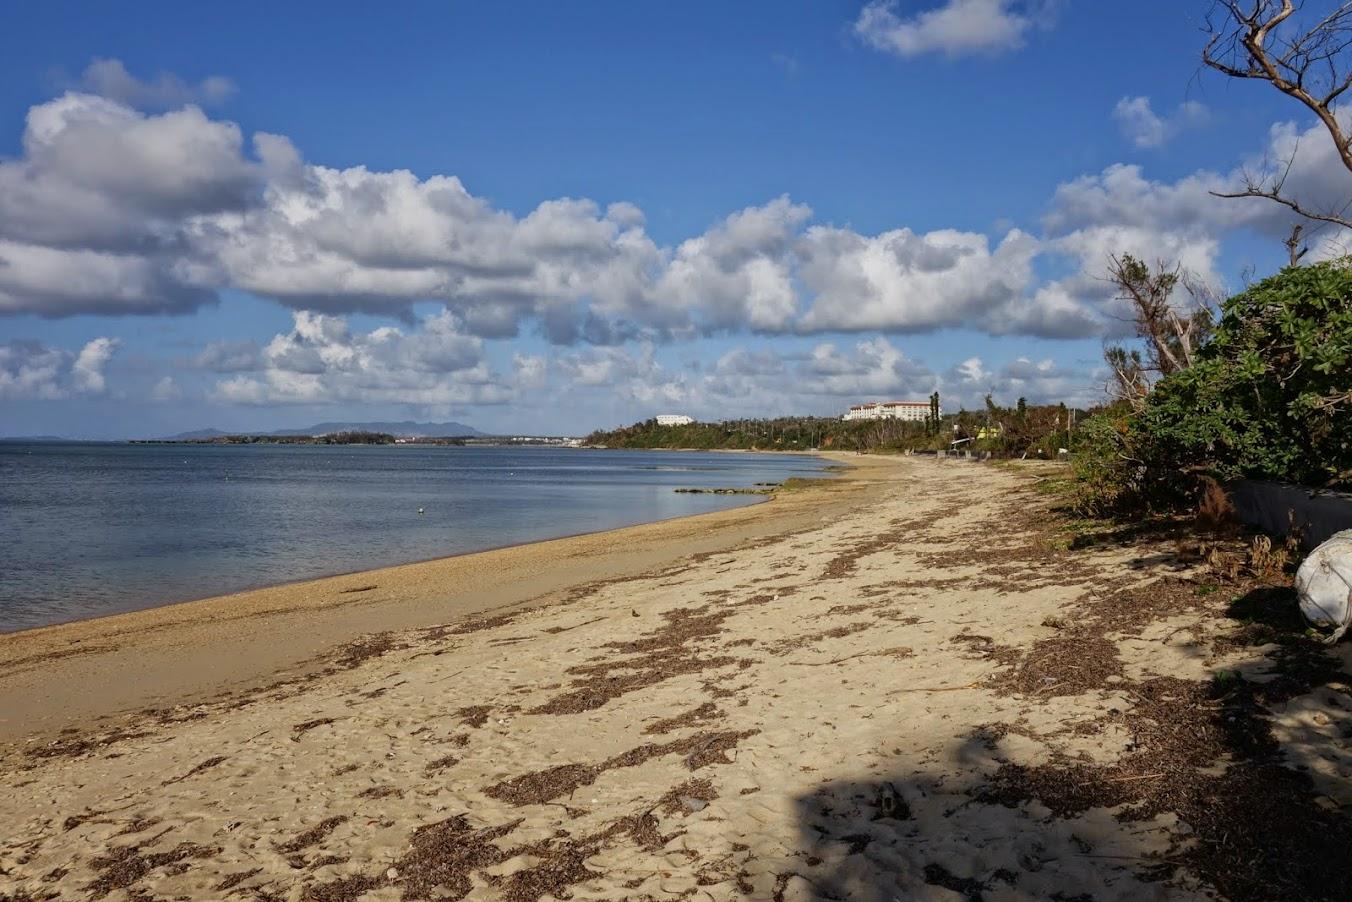 Tancha beach